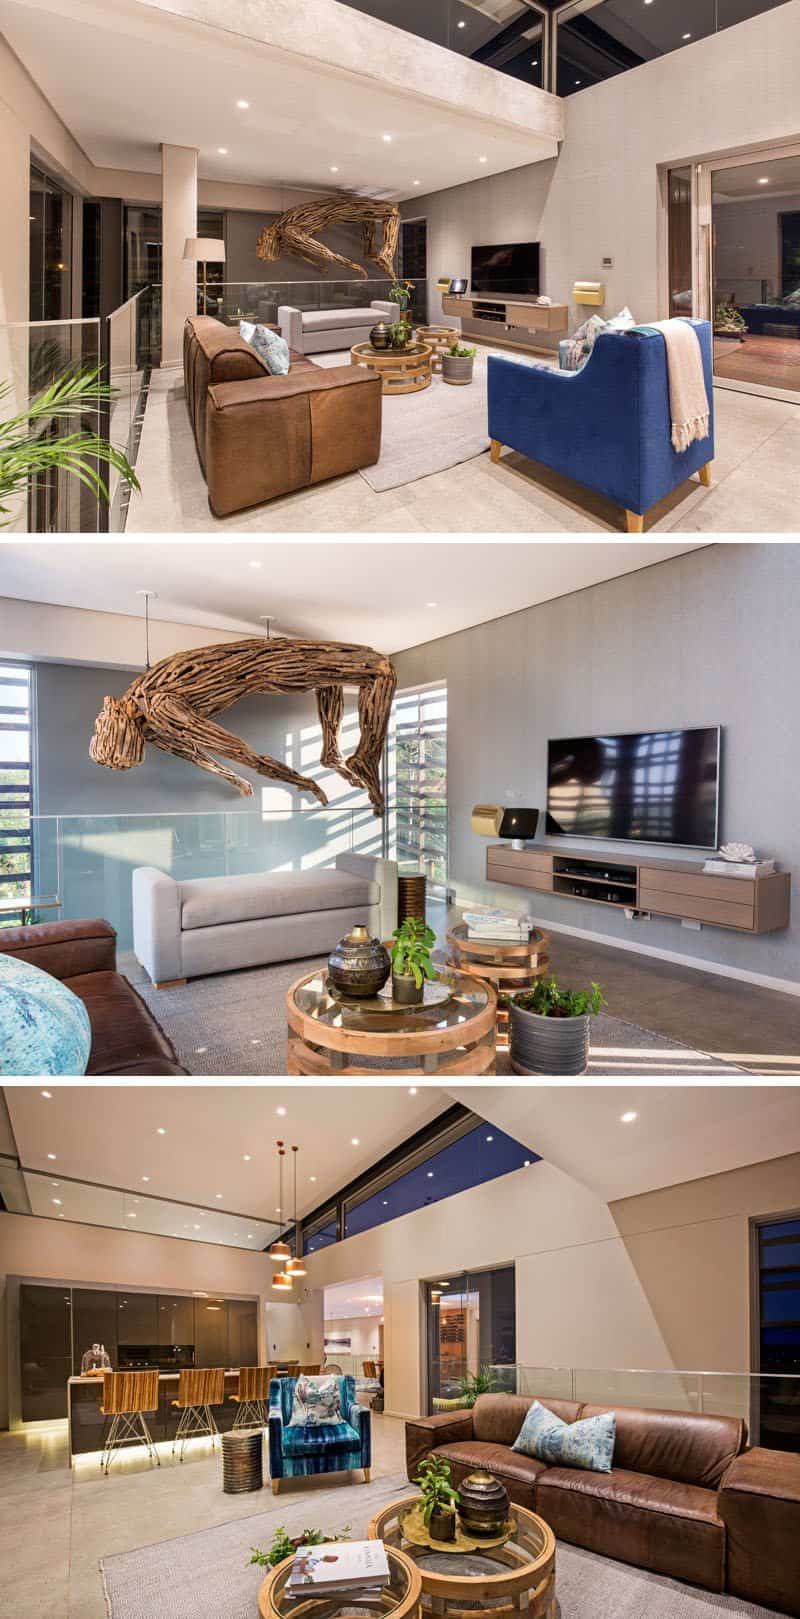 casa moderna alrededor de una piscina cubierta 3